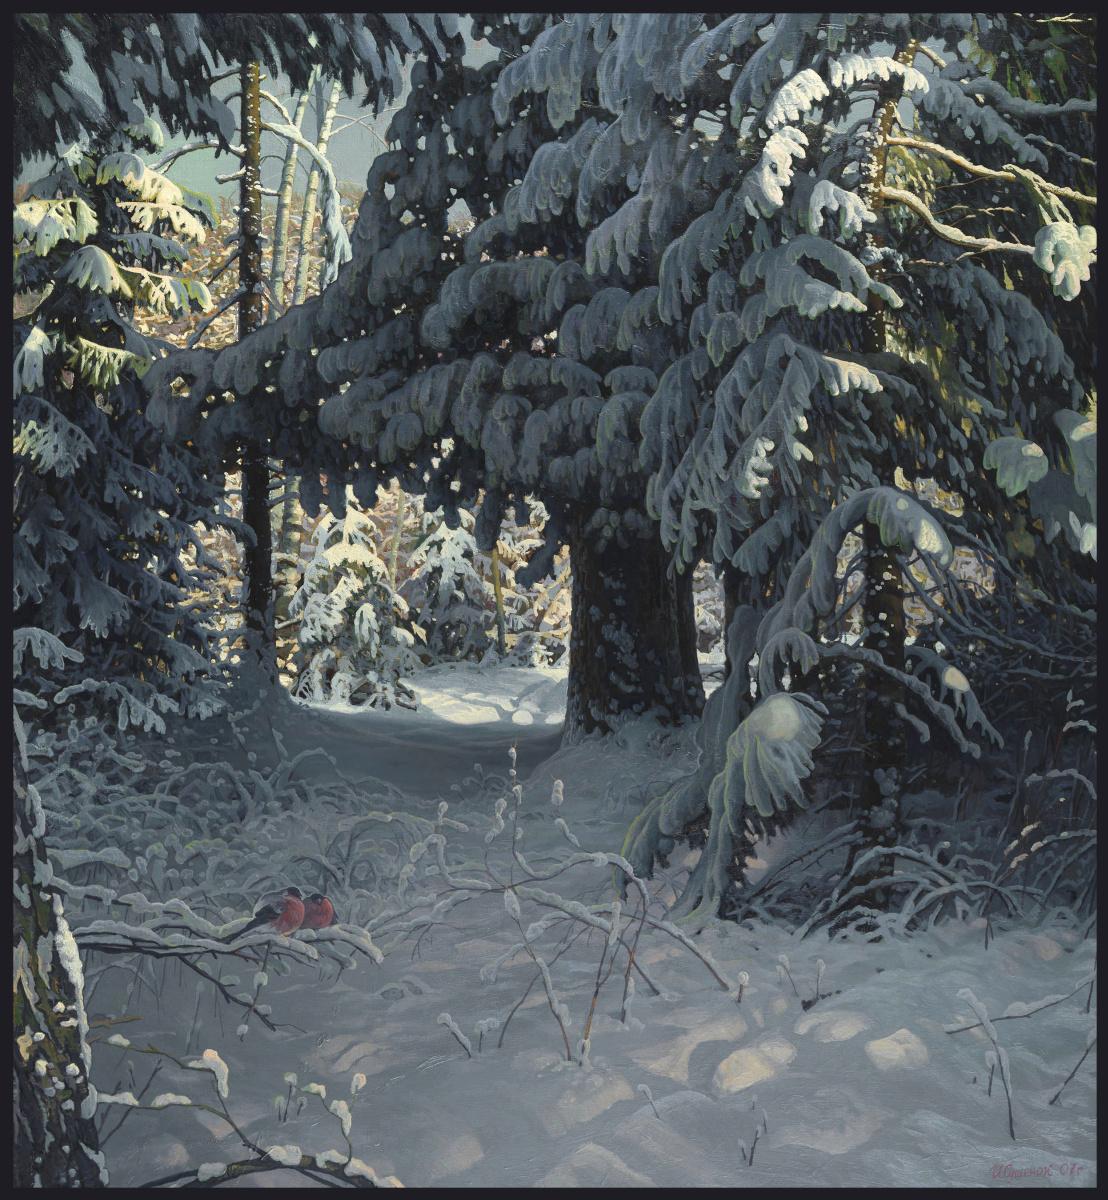 Sushienok64@mail.ru Михайлович Сушенок Игорь. Winter kingdom